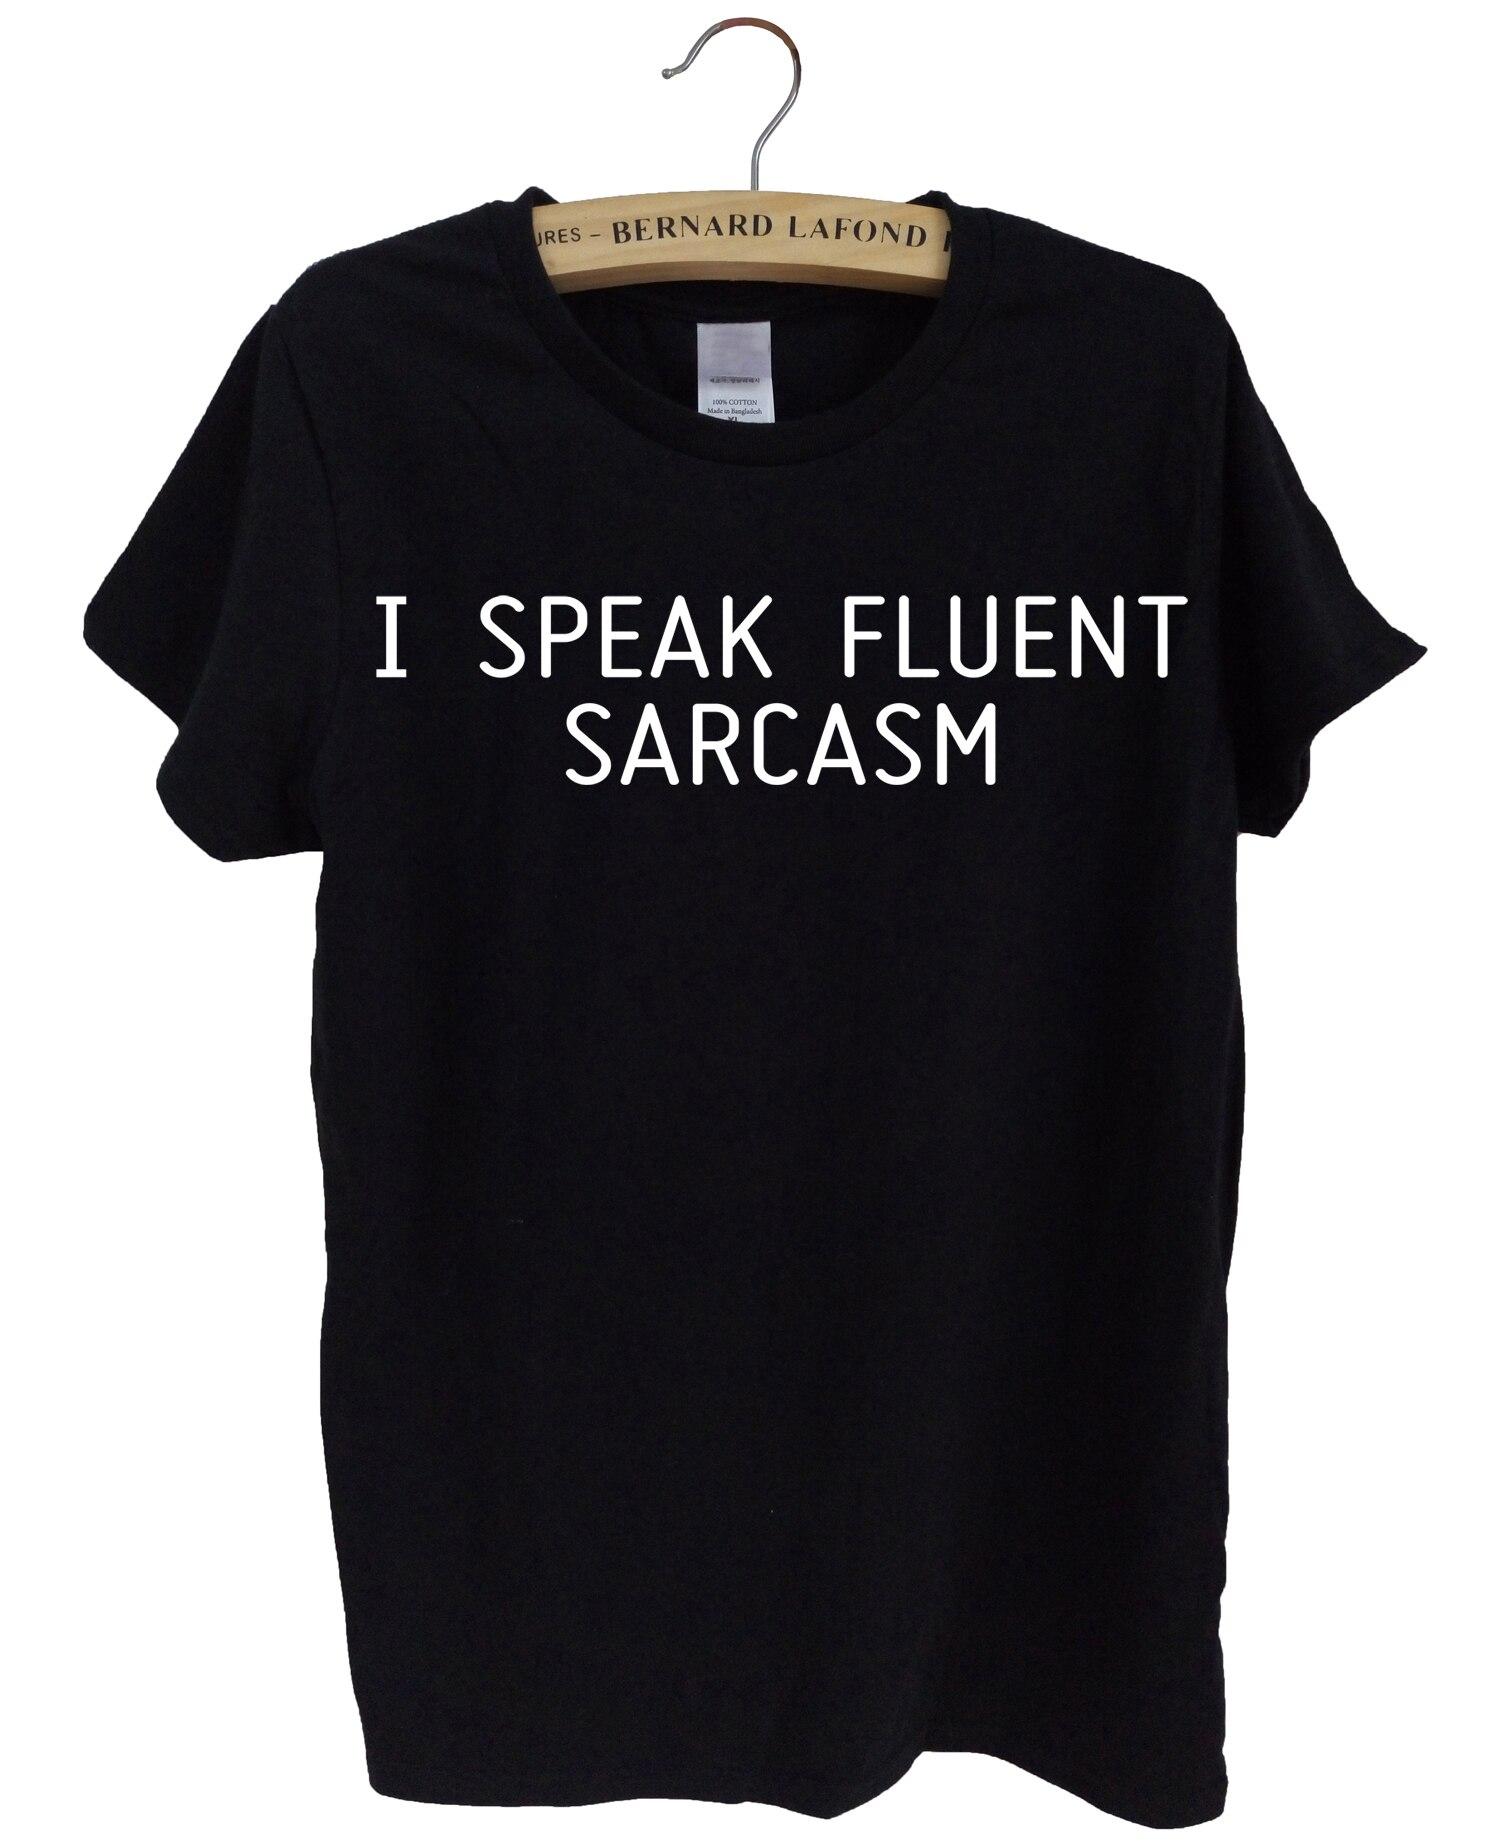 4d1645f48 2017 summer I SPEAK FLUENT SARCASM Women t shirt Fashion casual streetwear  hip hop Print short sleeve Sexy tshirt women tops tee - us613